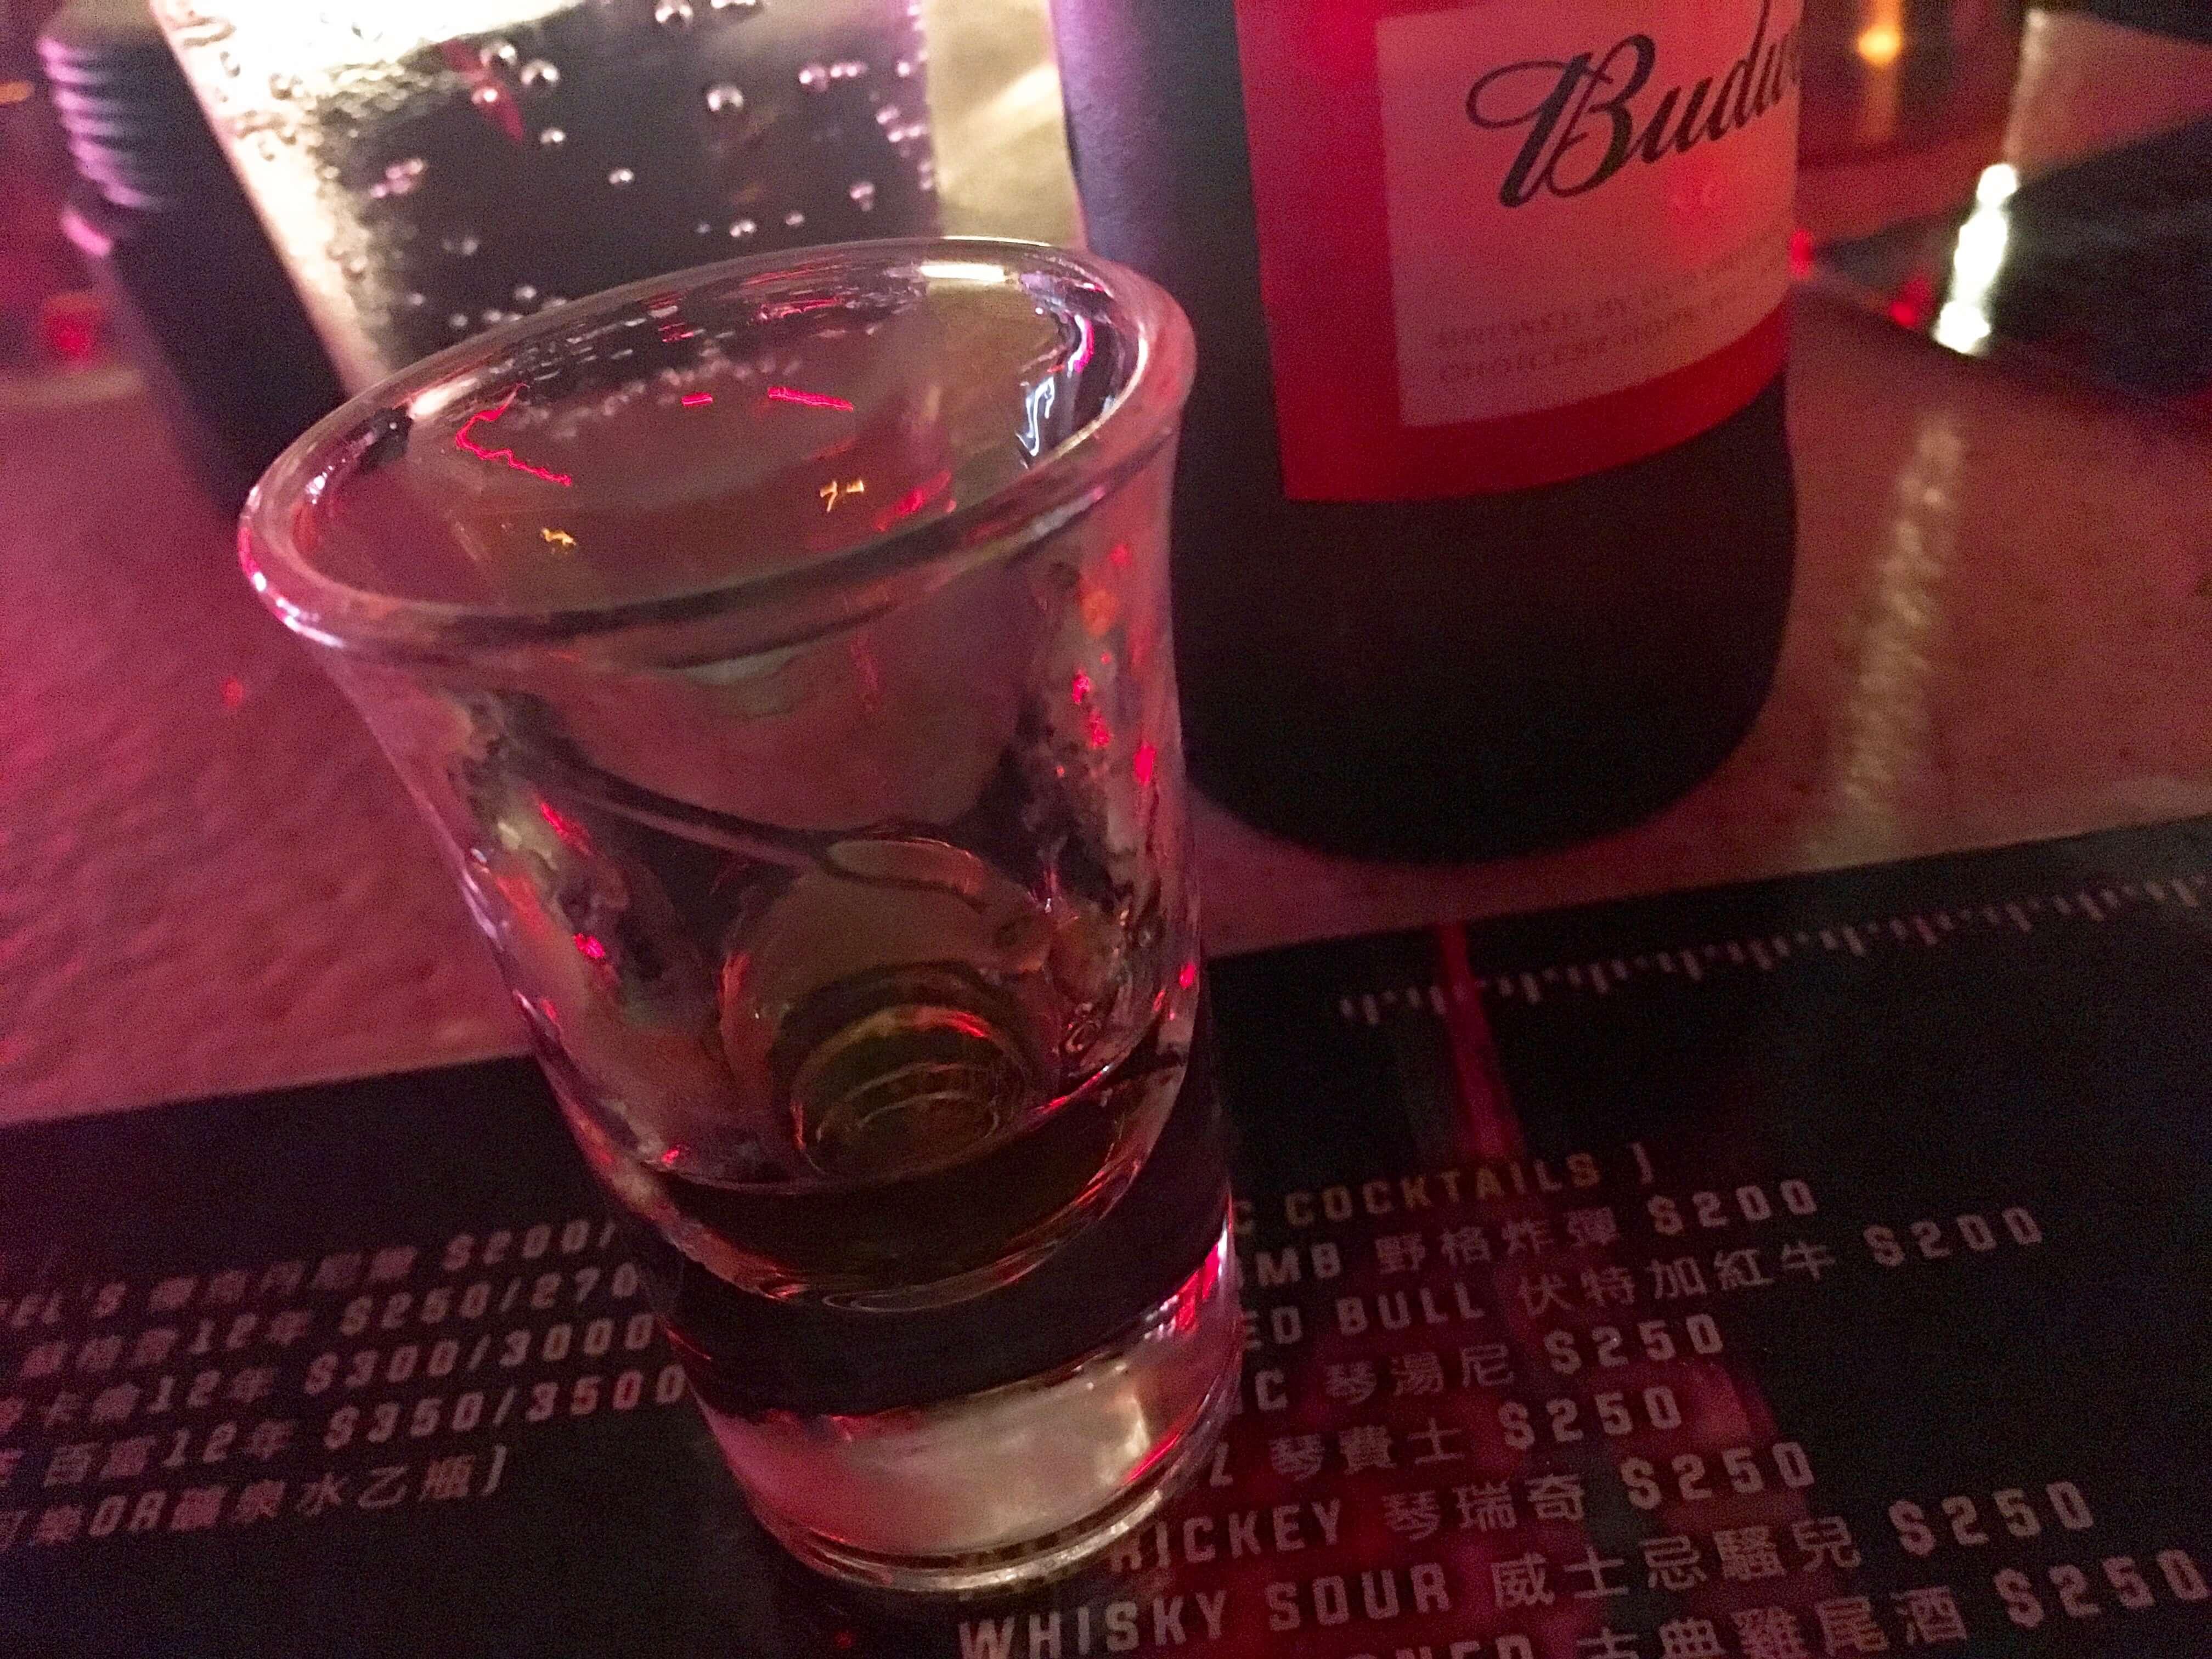 taboo ウィスキー